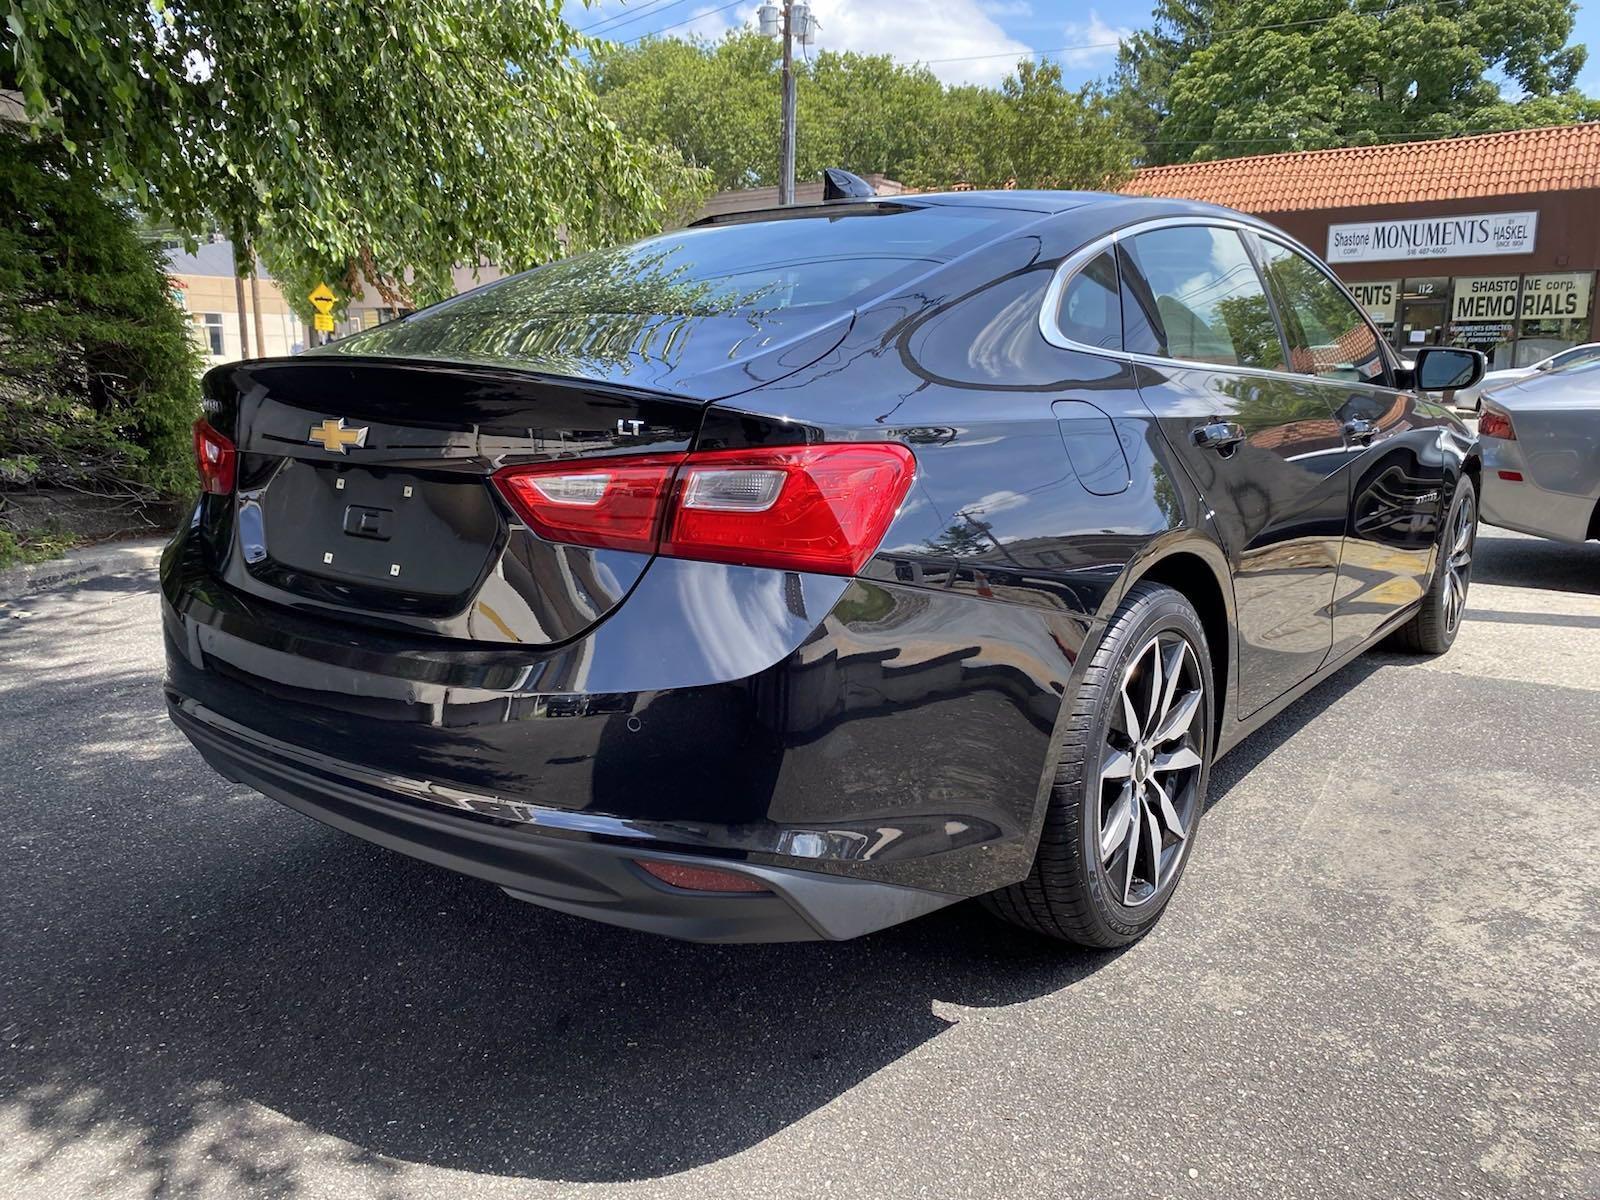 Used-2017-Chevrolet-Malibu-LT